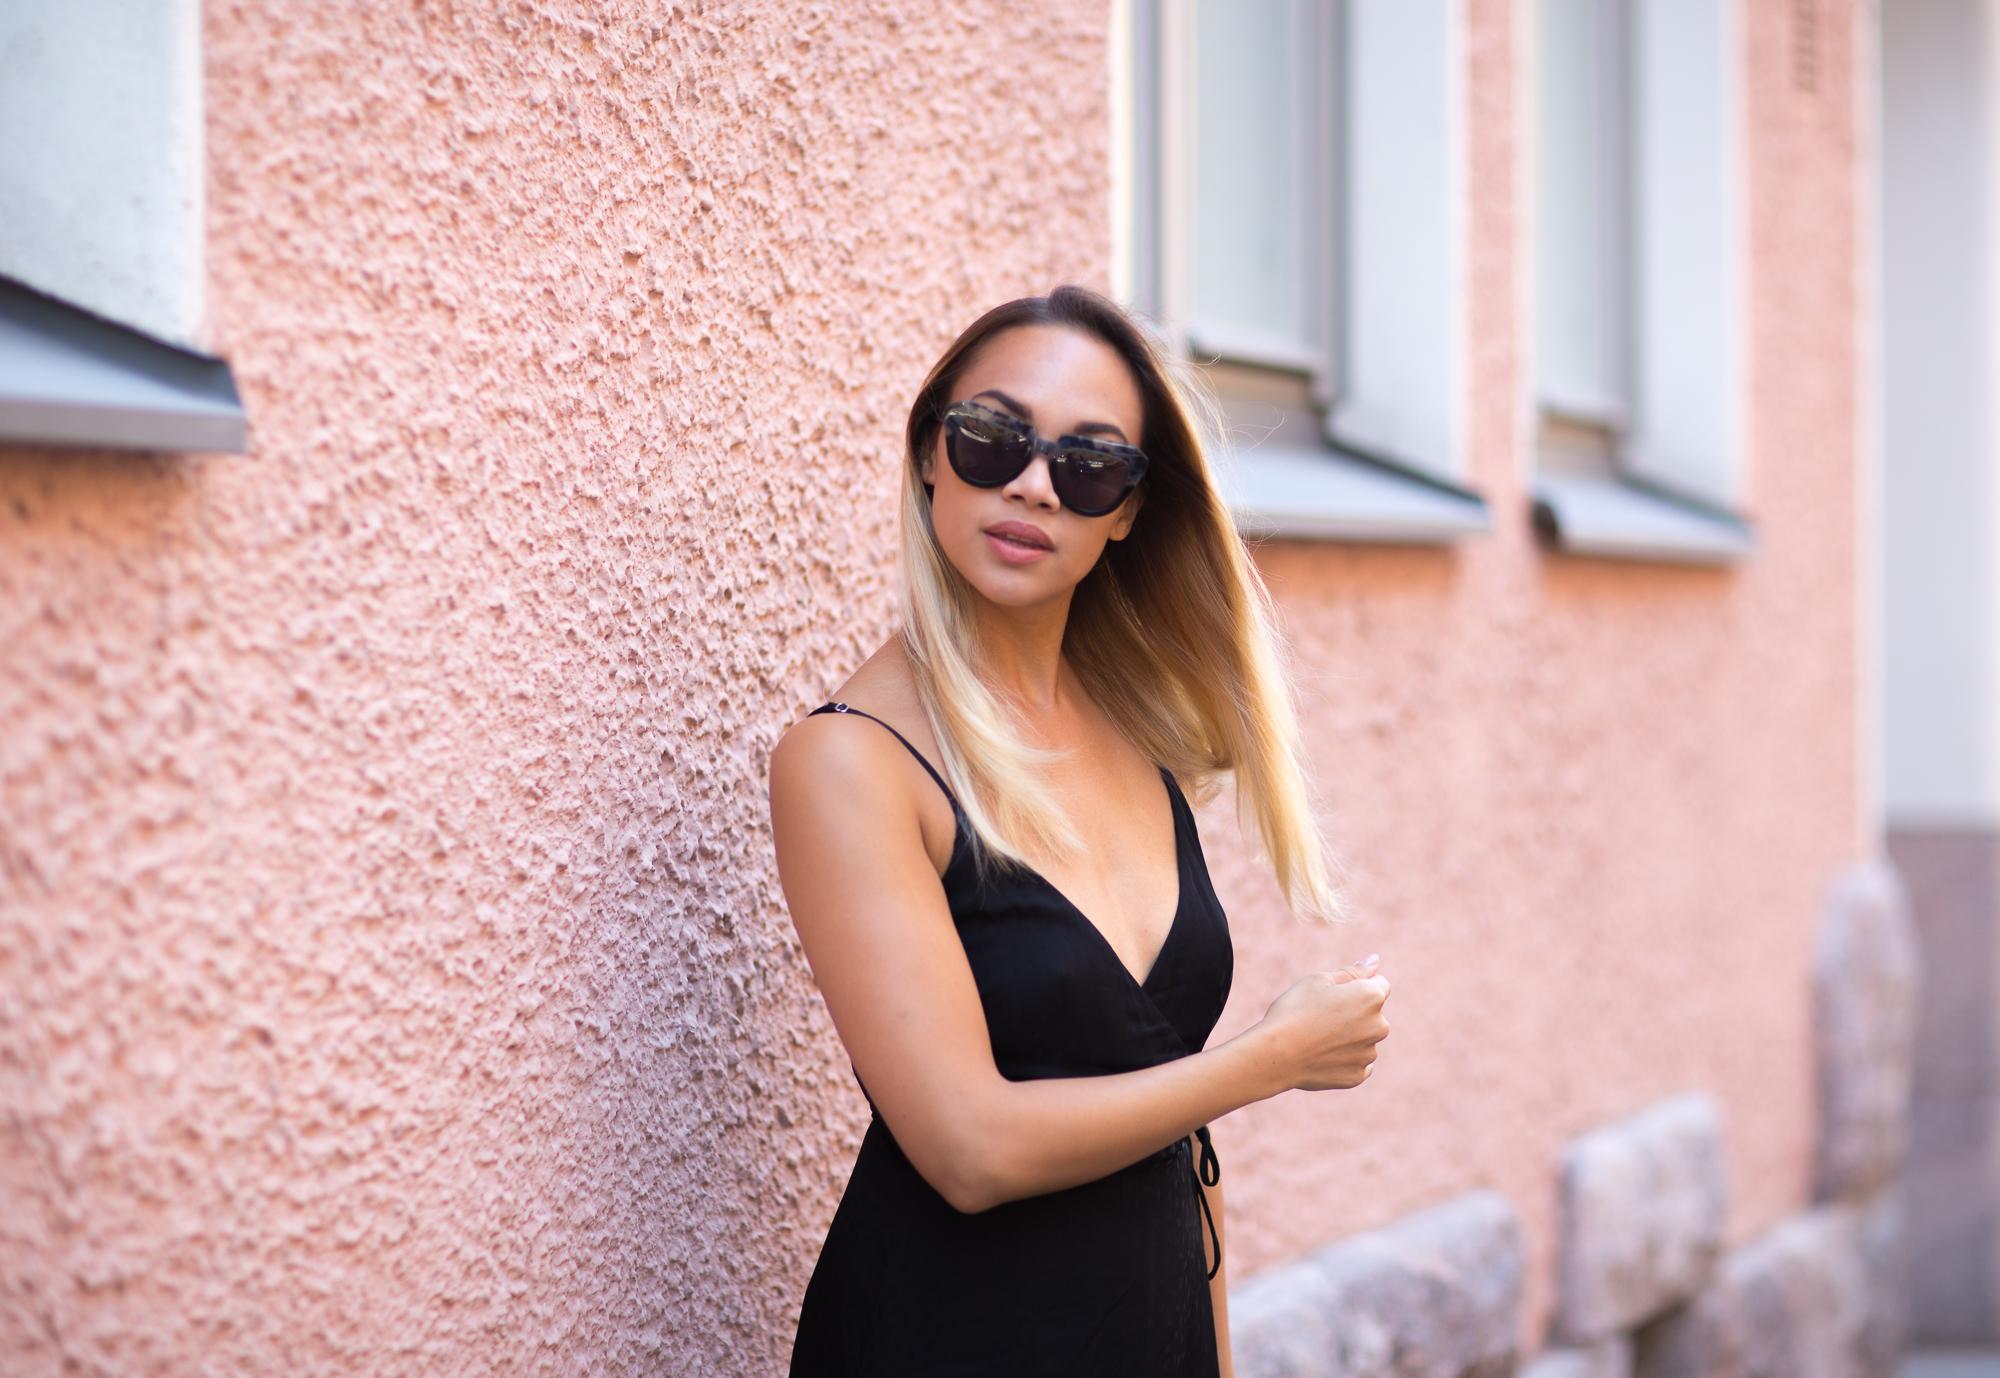 Kriselda_Mustonen